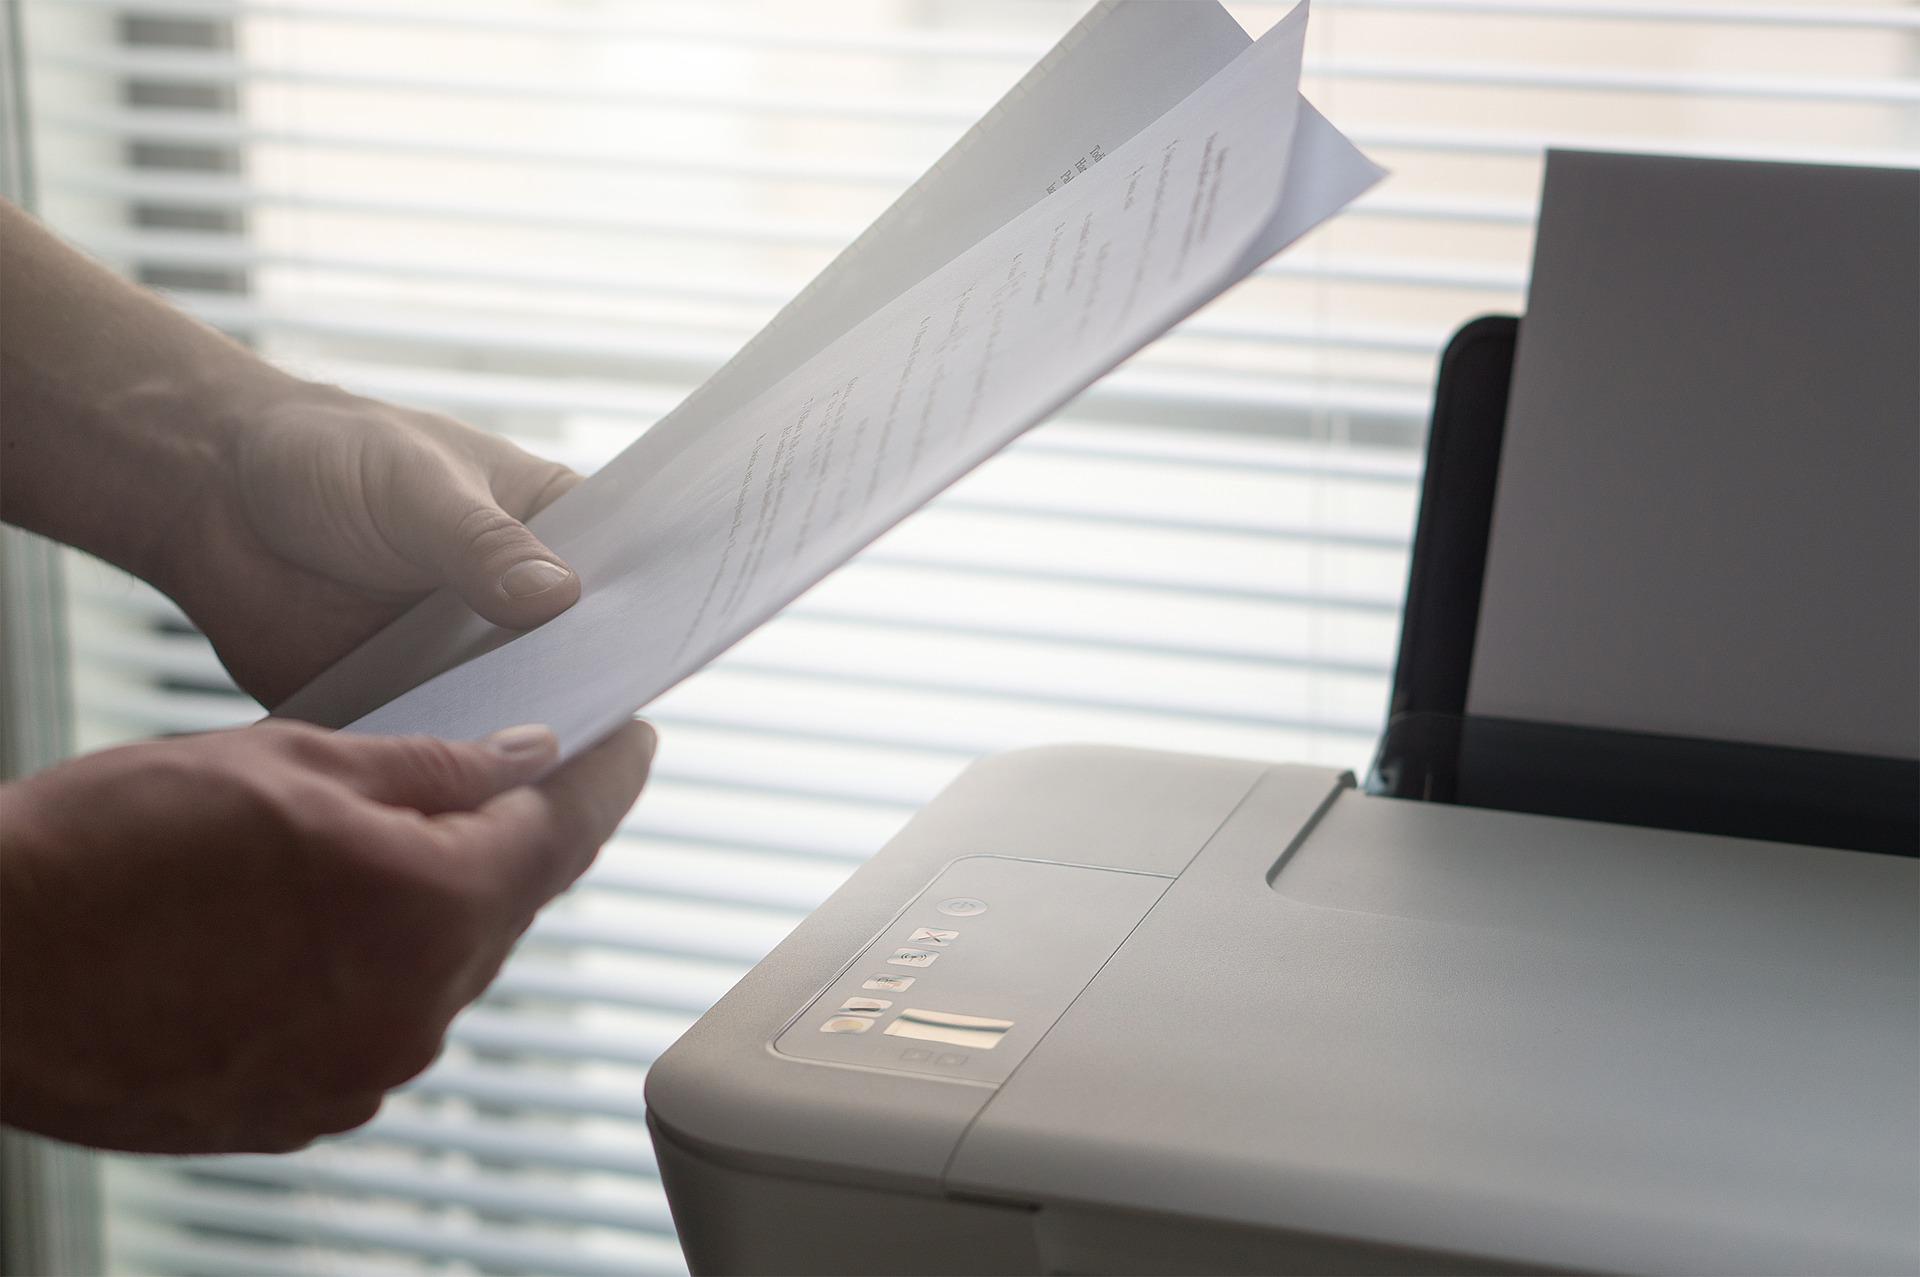 Niewielka drukarka laserowa do domu – HP m15a!